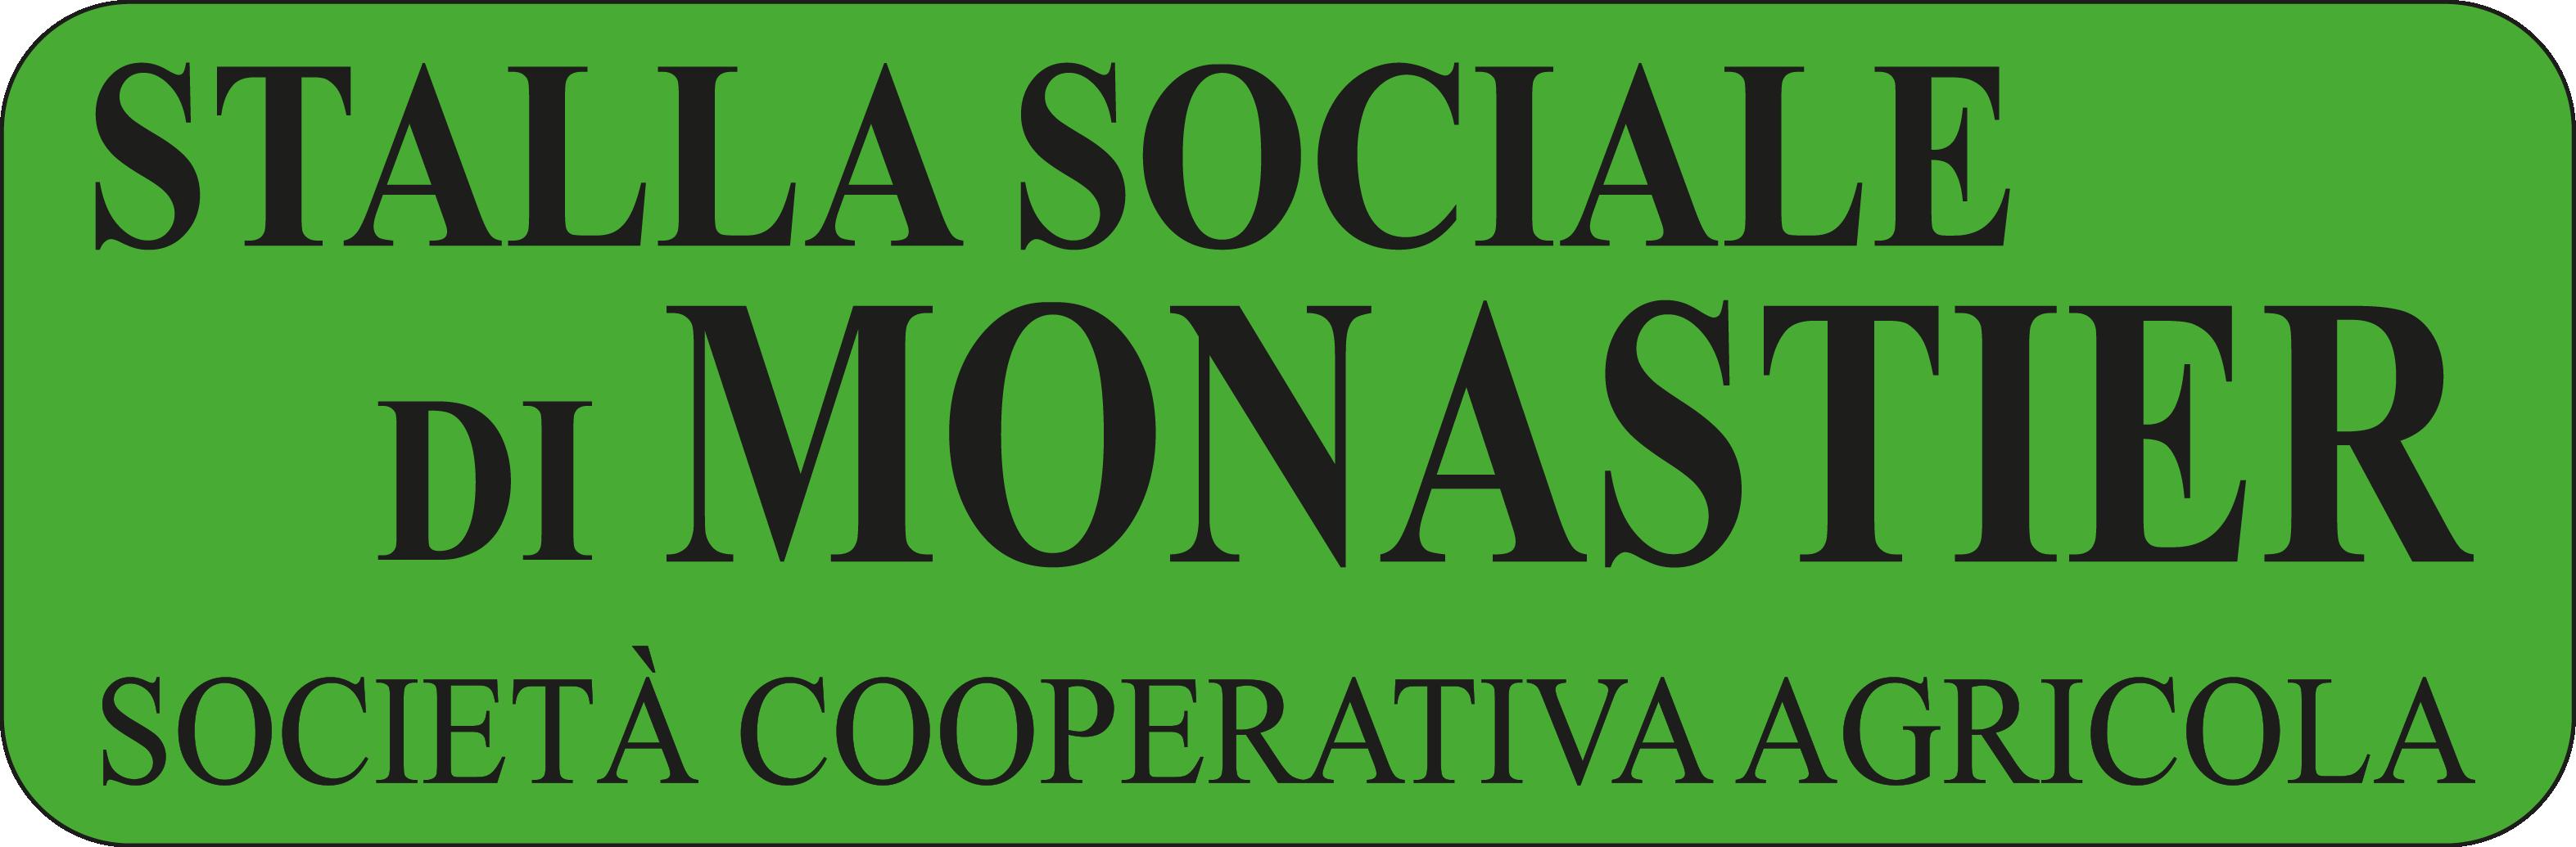 Stalla Sociale Monastier